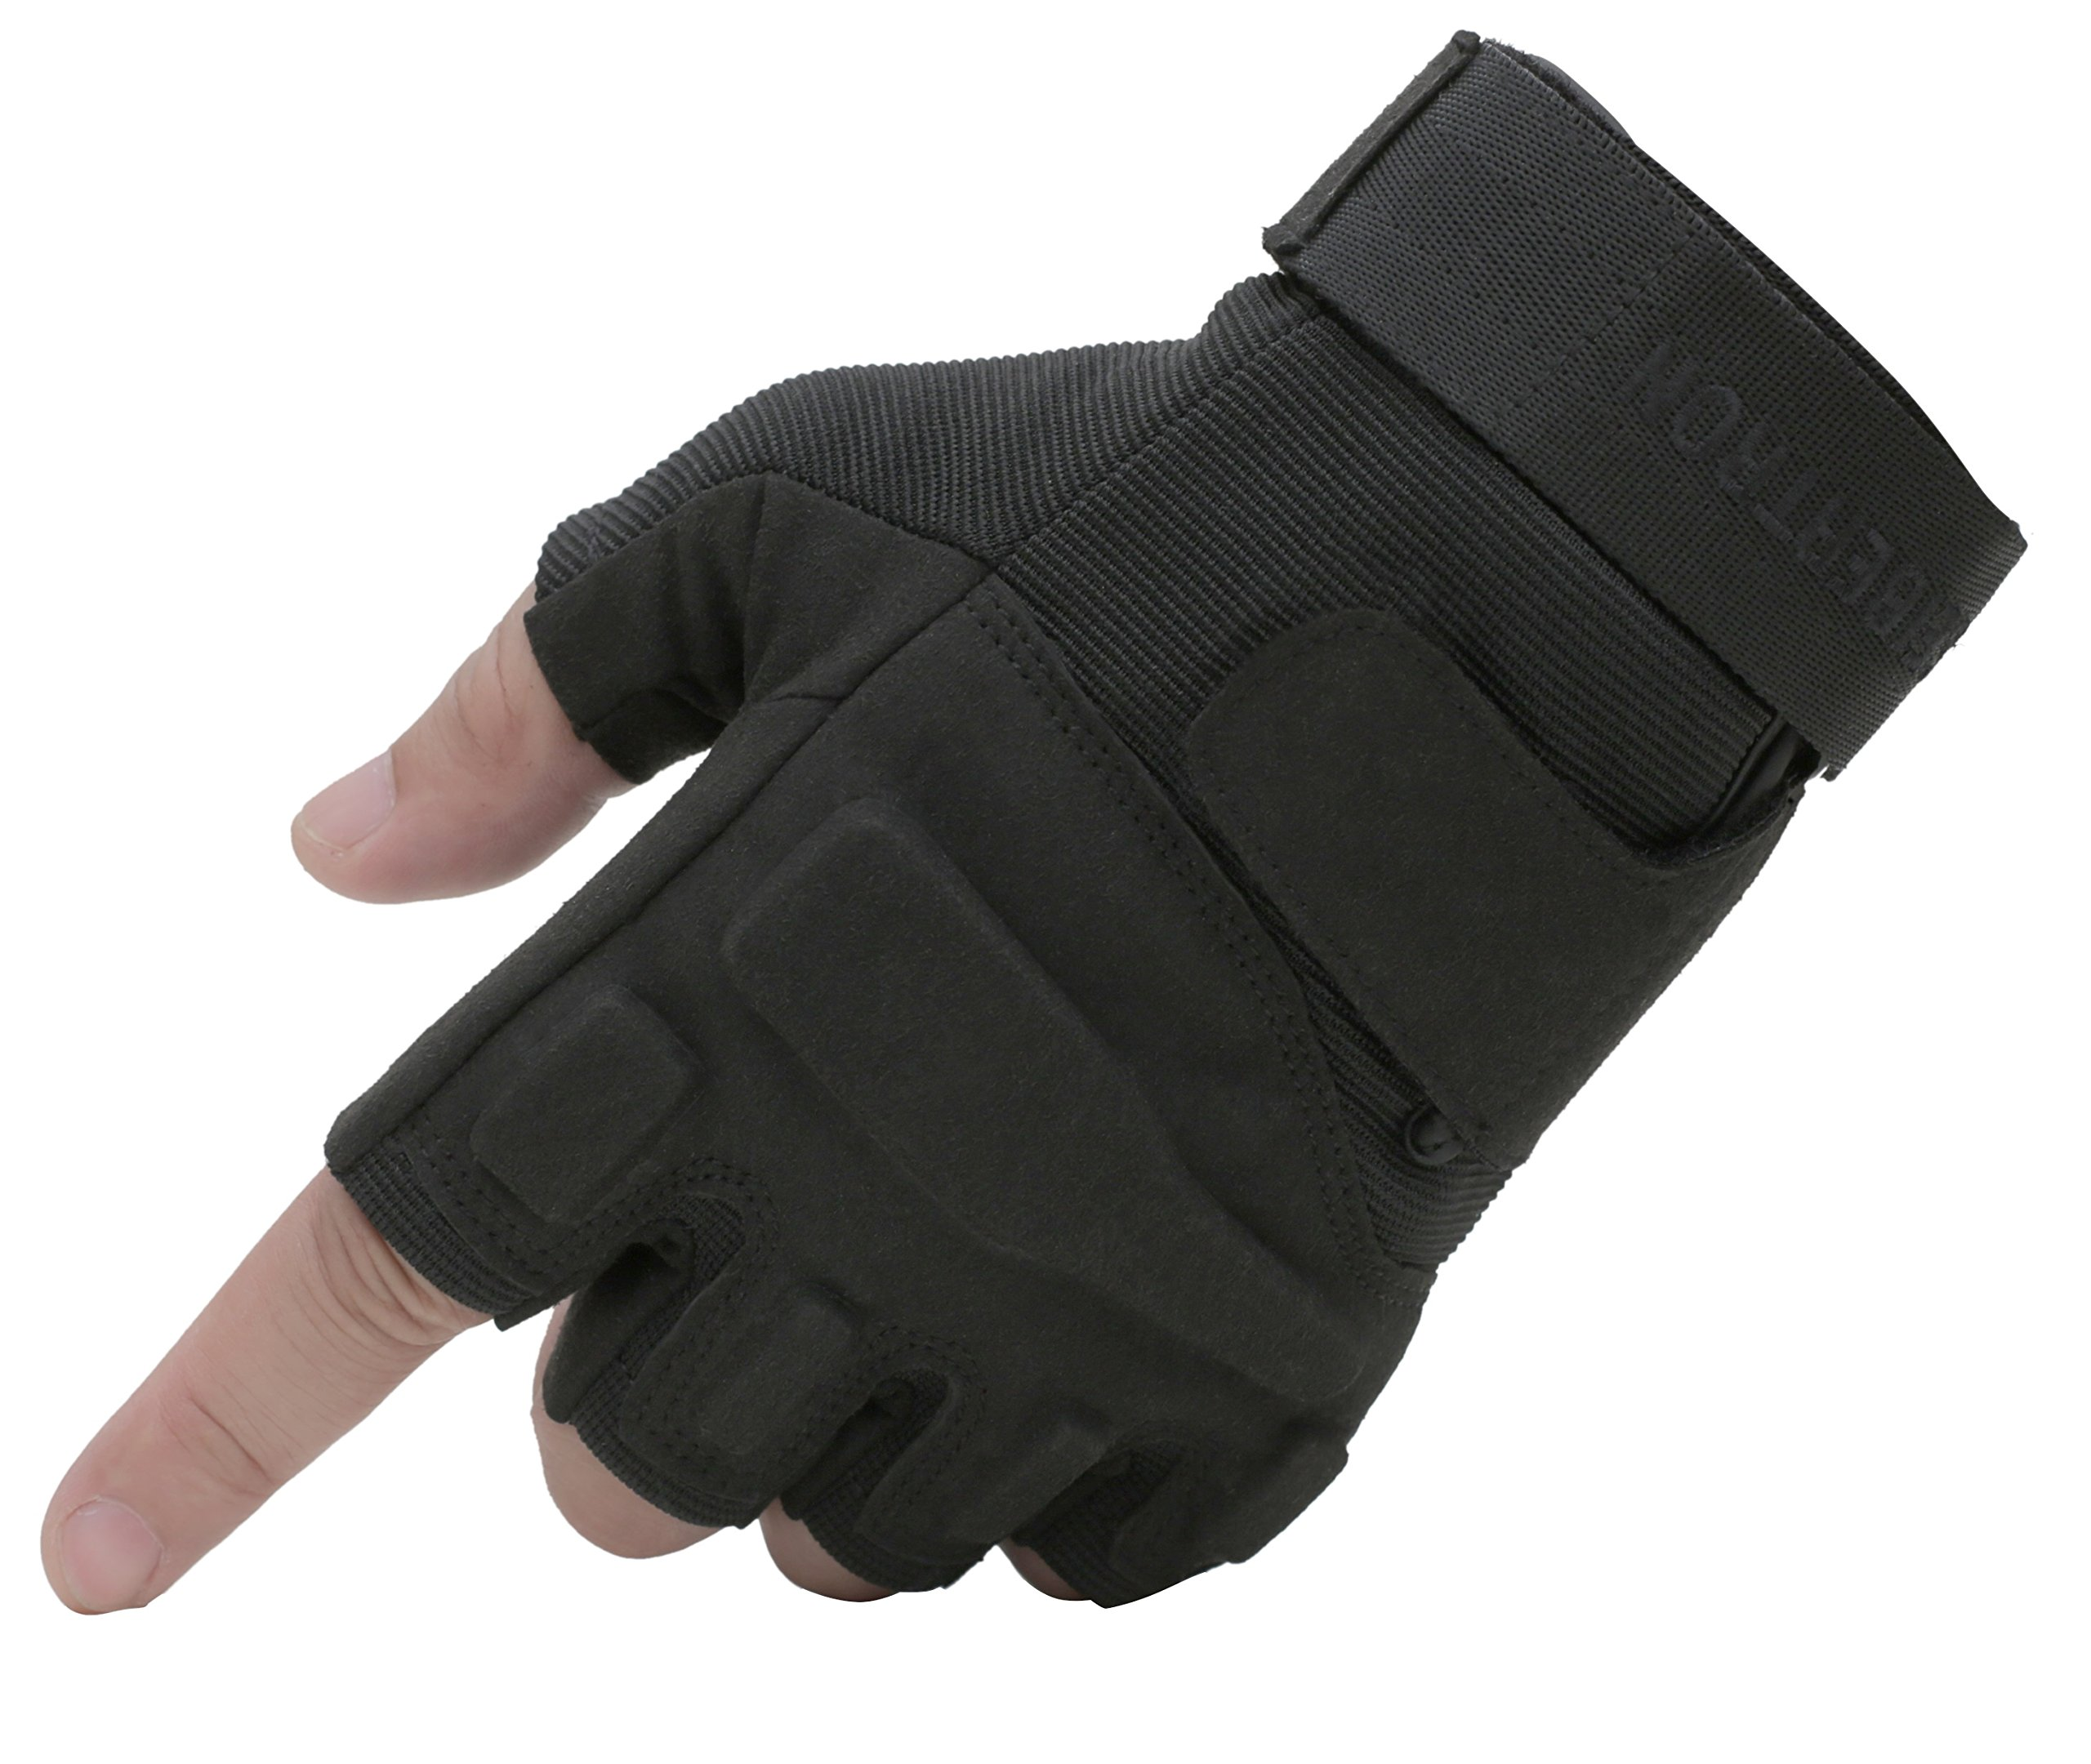 Seibertron Men's Black S.o.l.a.g. Special Ops 1/2 Finger Light Assault Gloves Tactical Fingerless Half Finger Gloves